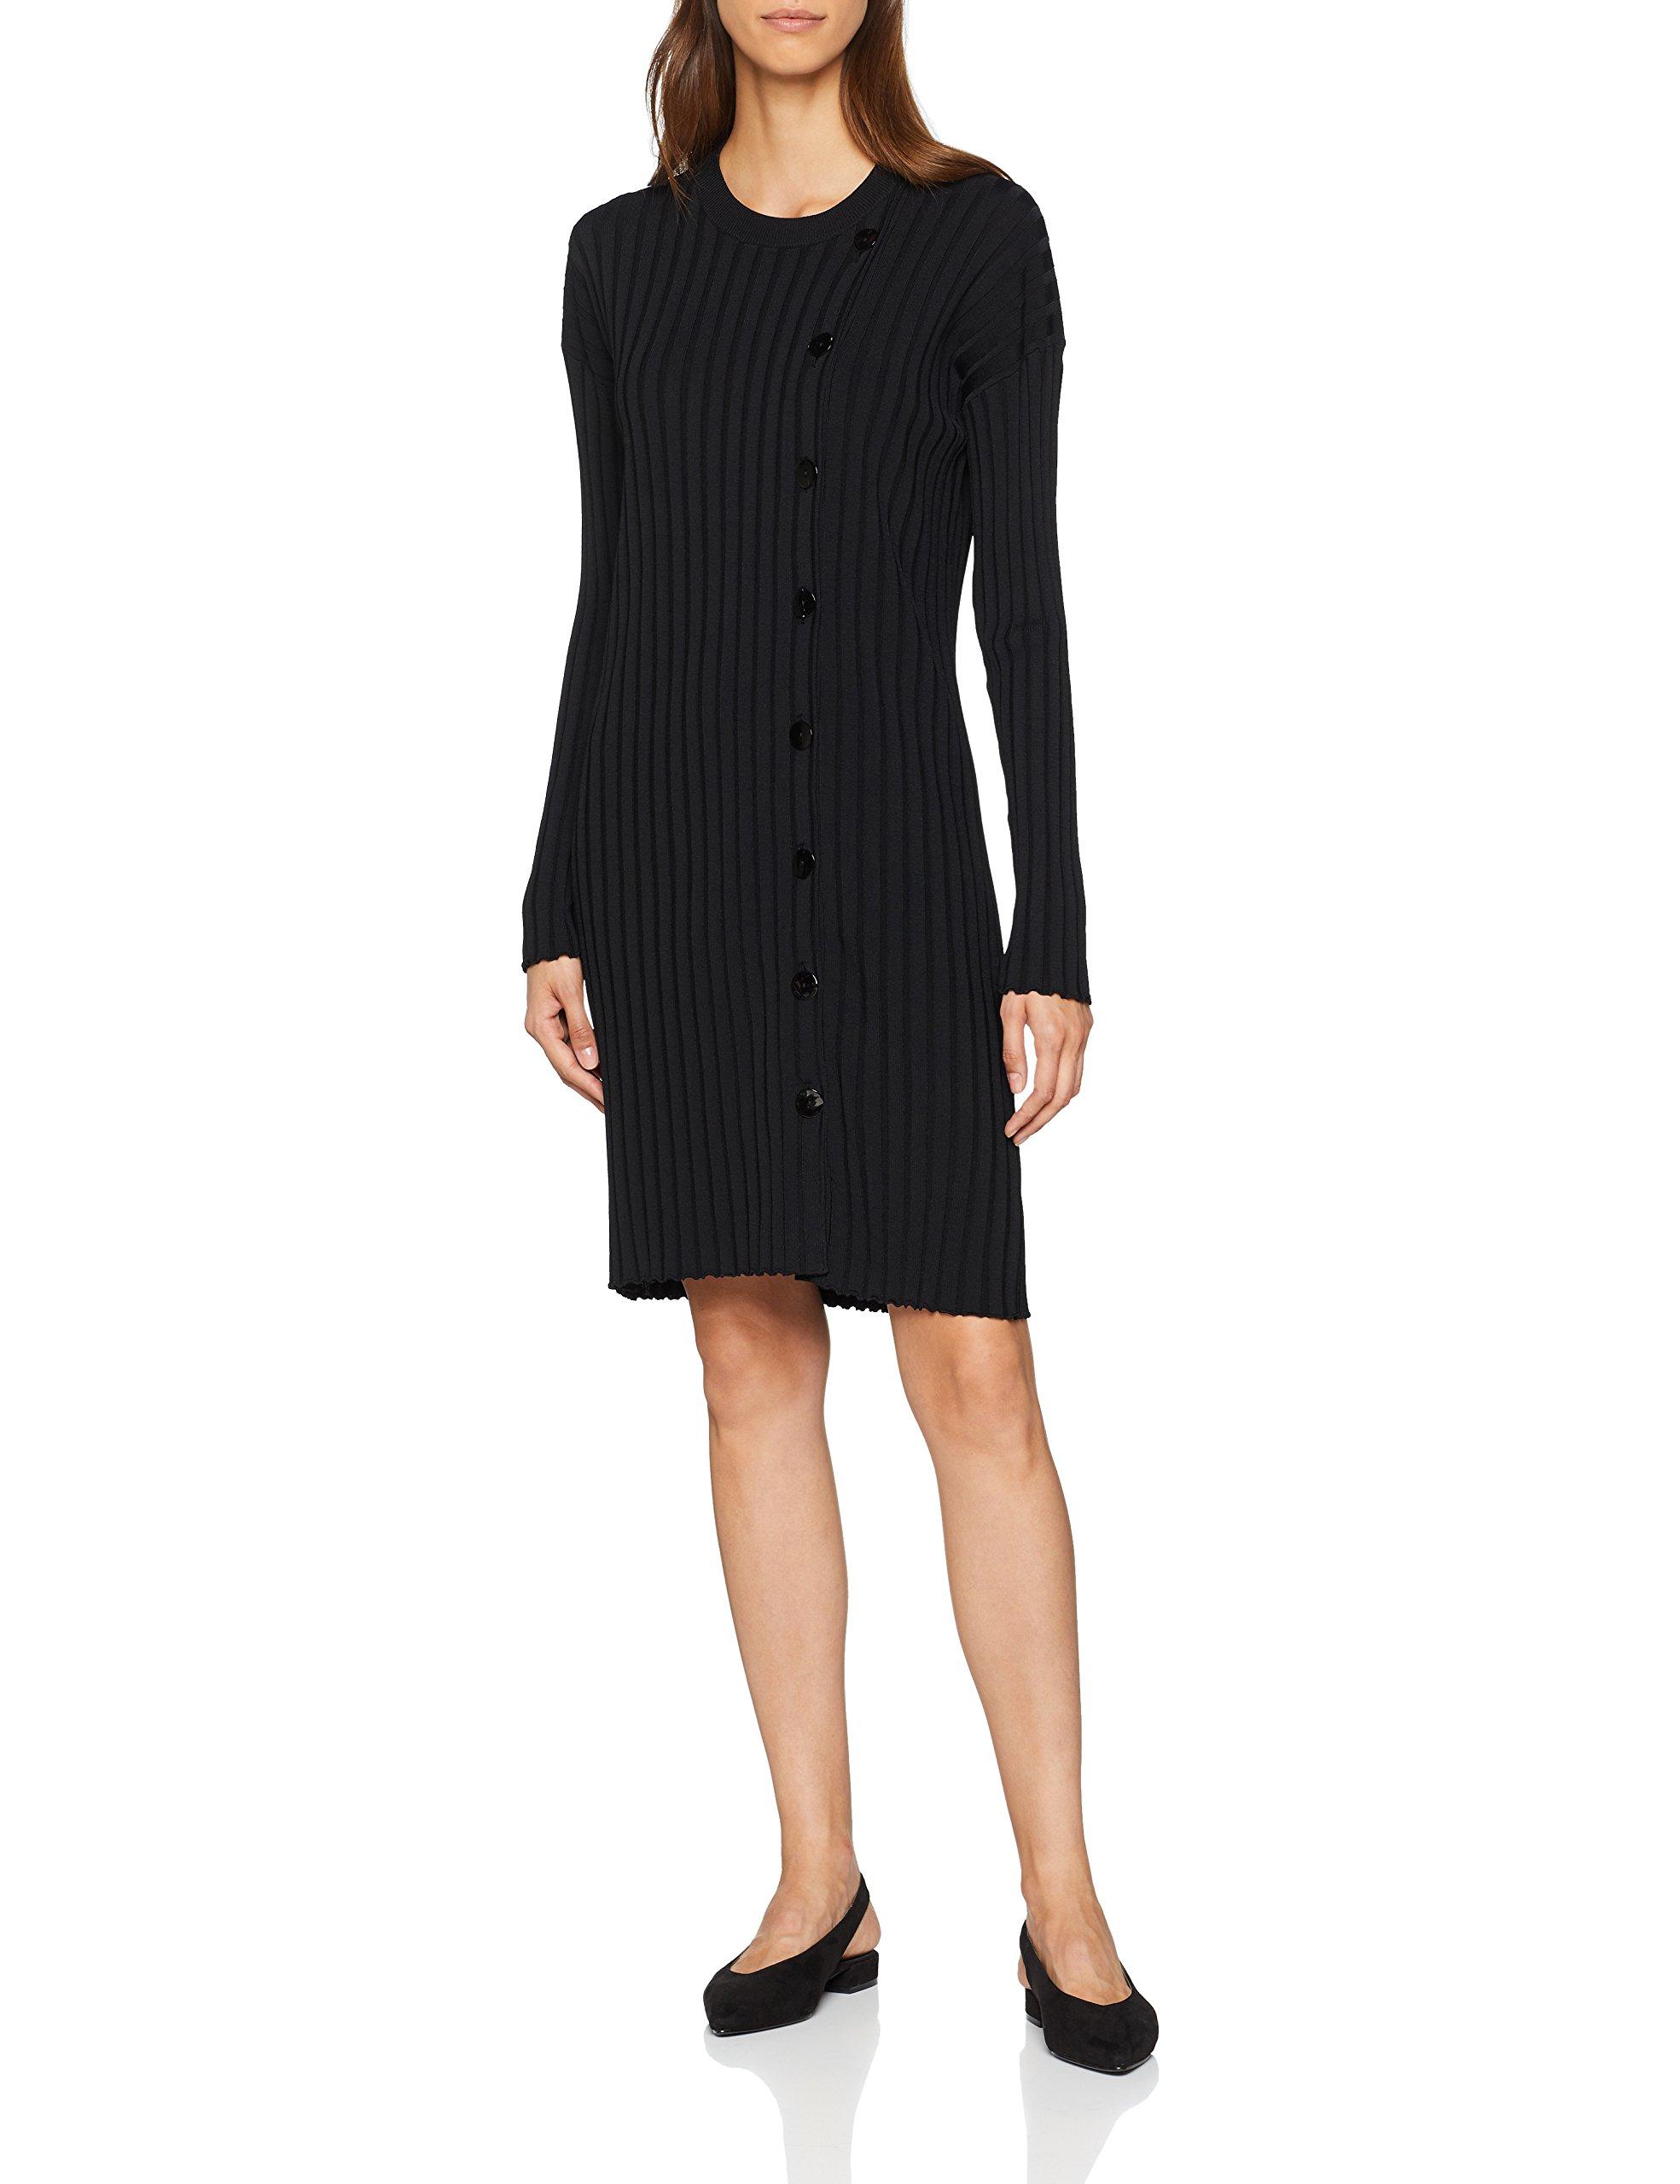 DressRobe Filippa FemmeNoirblack40taille Fabricant K m Longues Tunic Manches Tricoté Button 5L3Sq4ARjc